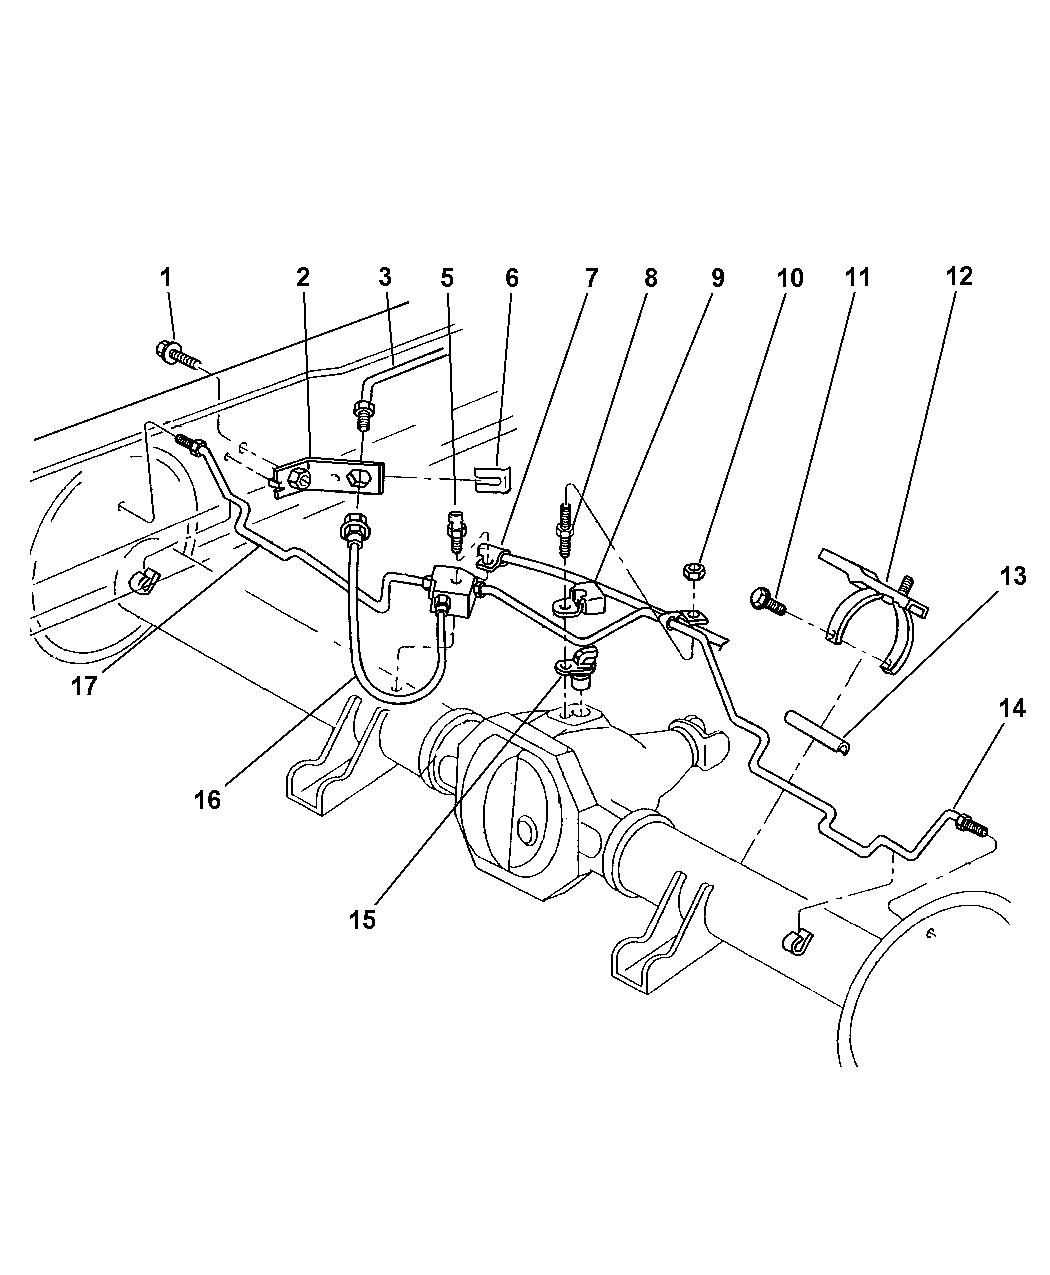 1997 Dodge Ram 2500 Lines & Hoses, Brake, Rear